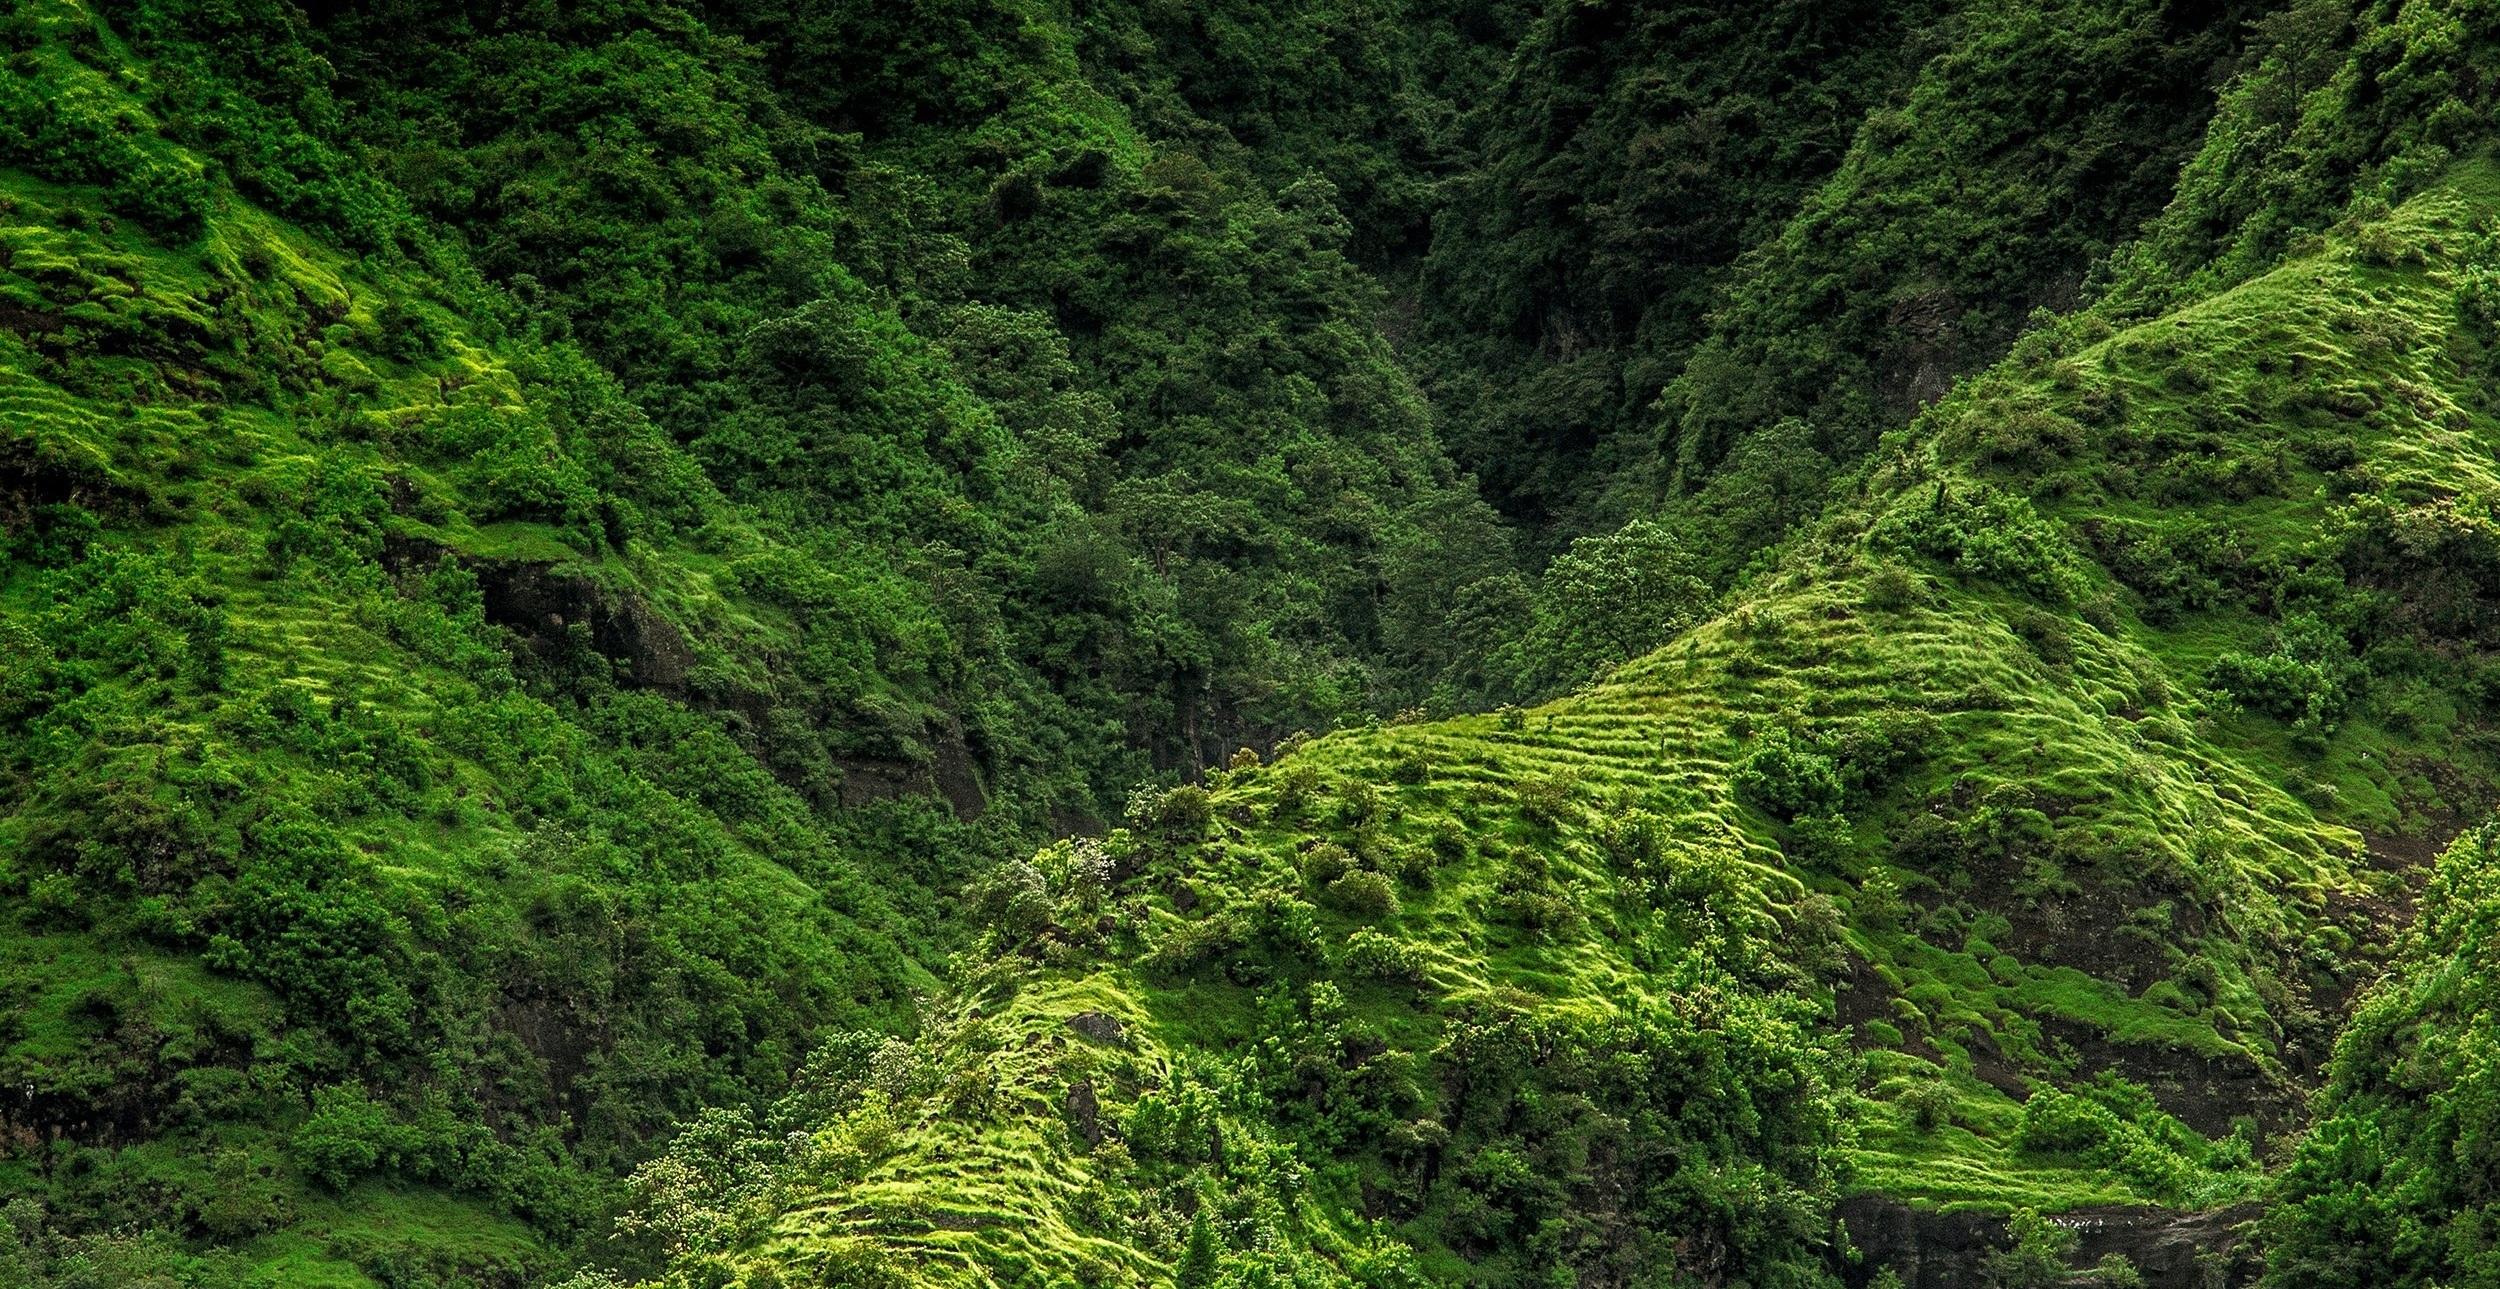 Bali, Indonesia. Photo by    Marek Okon    on    Unsplash   .